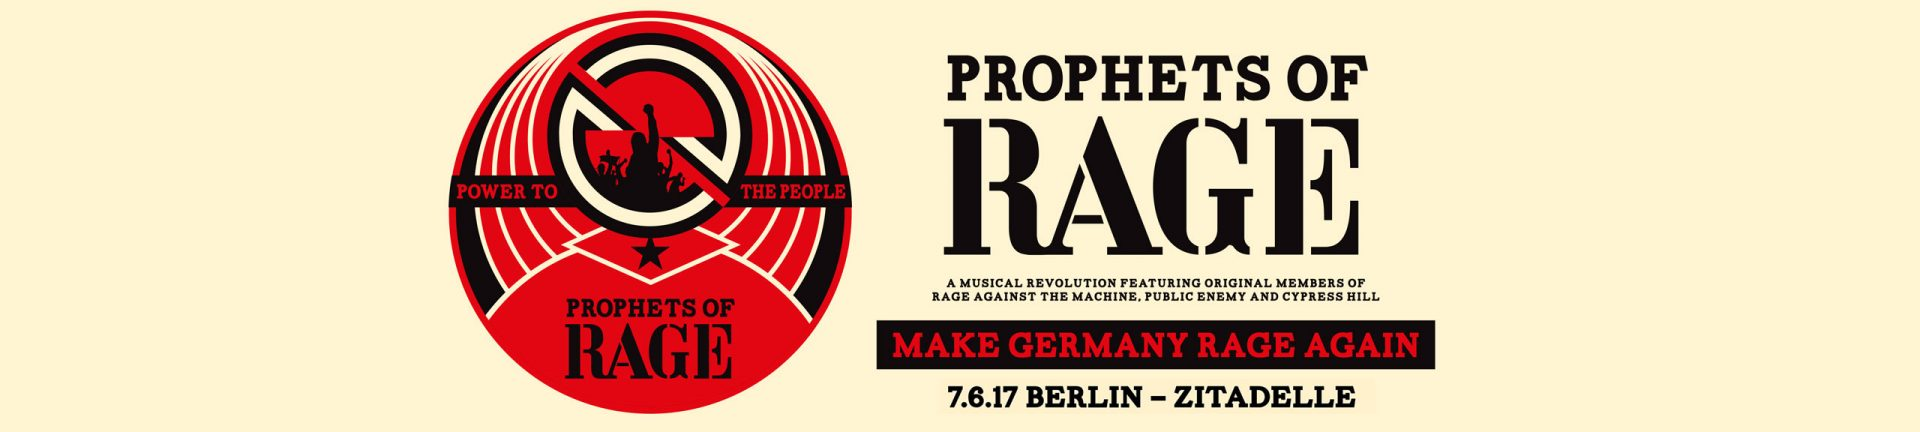 banner-prophets-of-rage